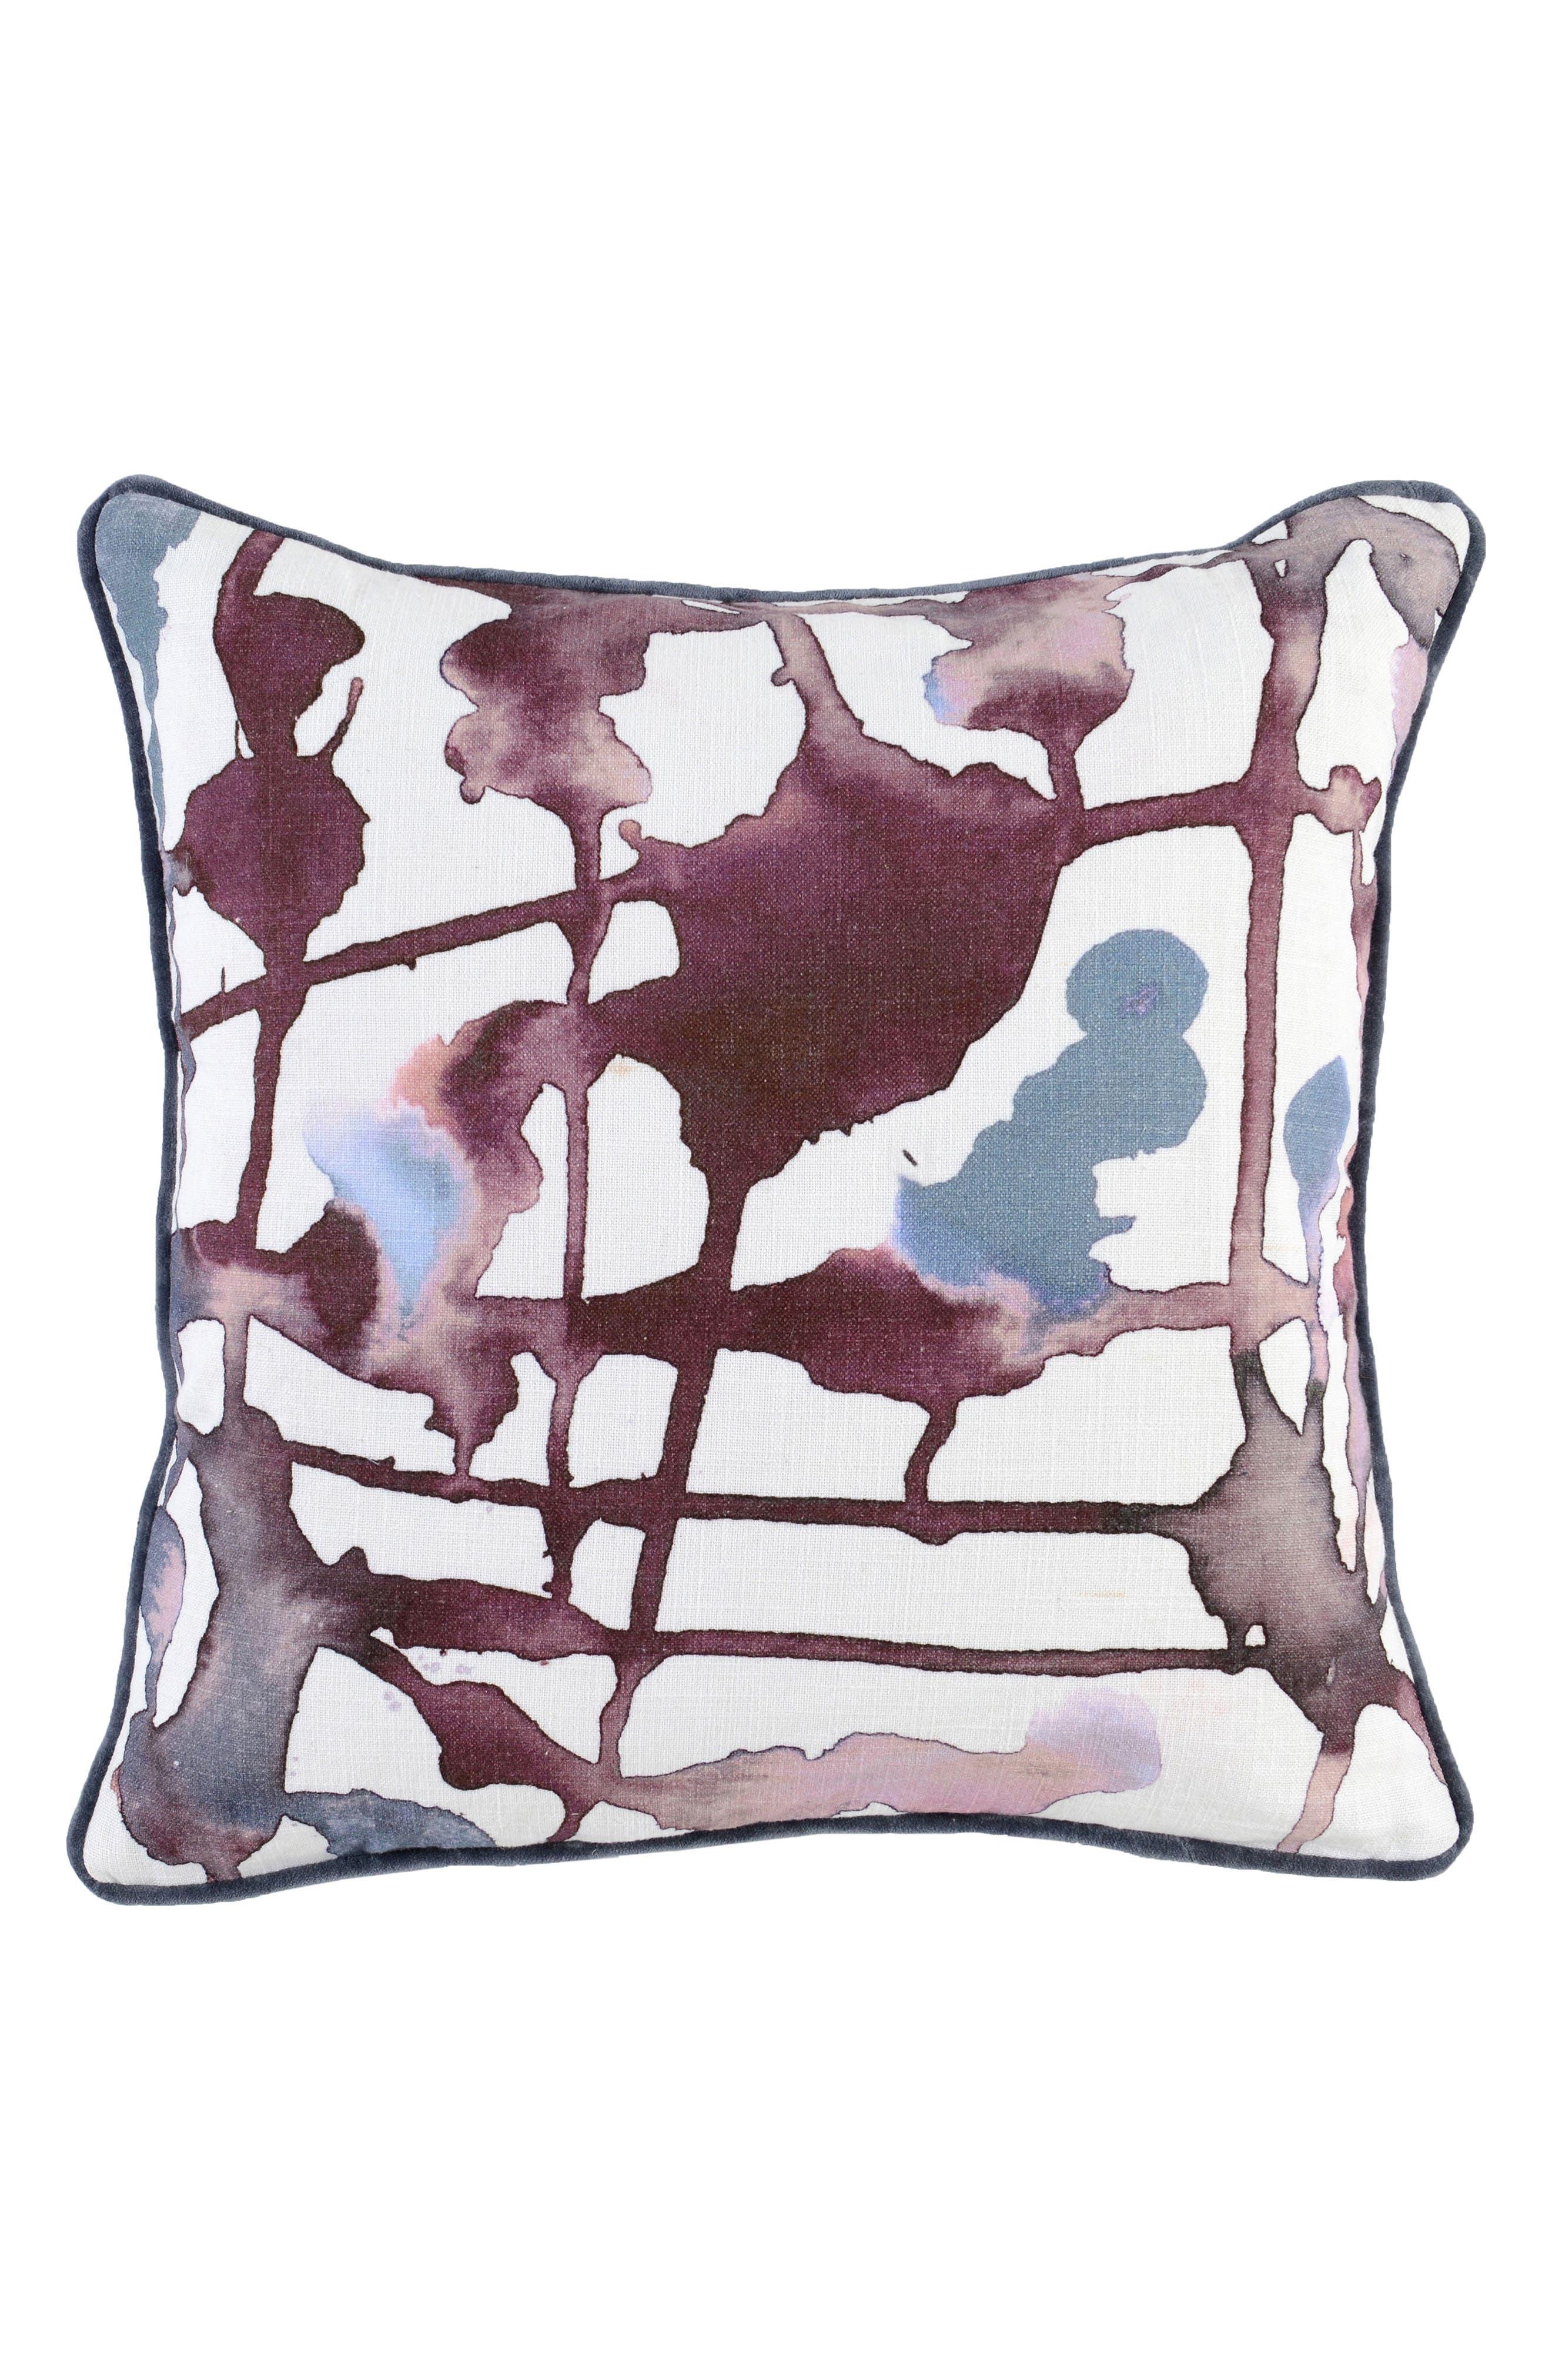 Lillian Accent Pillow,                             Main thumbnail 1, color,                             Wine/ Gray